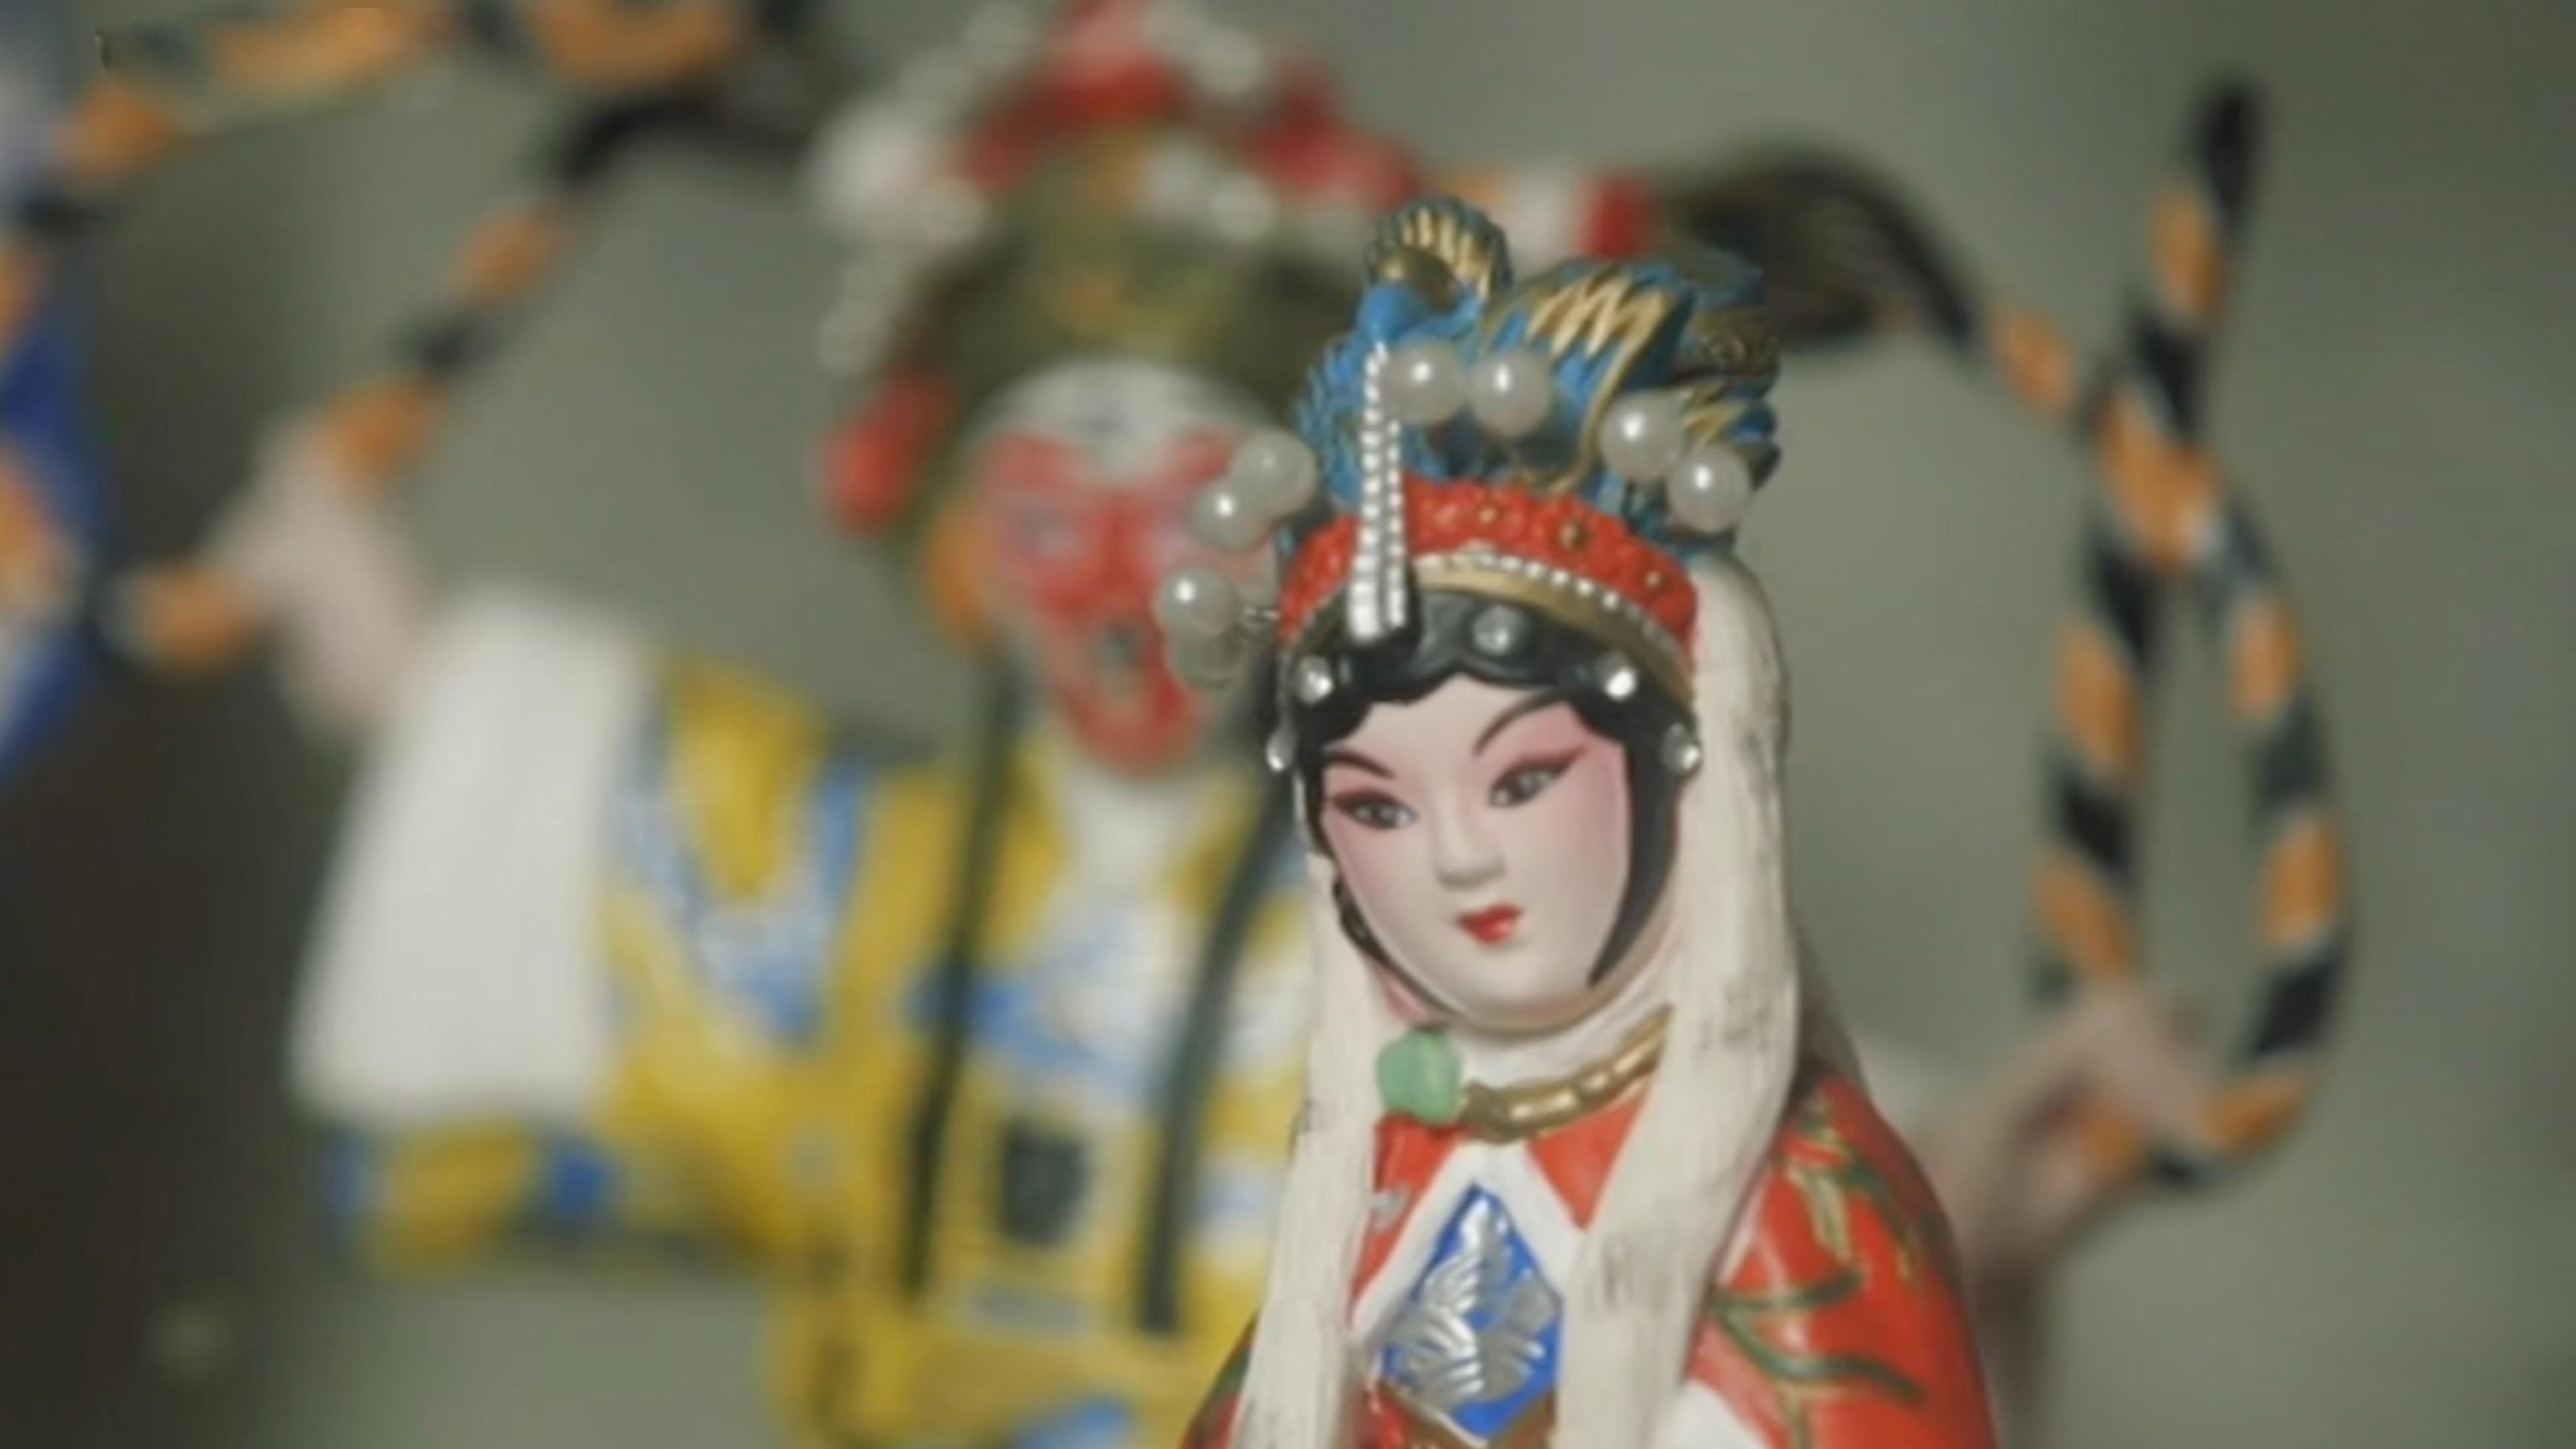 an analysis of the peking opera of the 19th century Latest kennesaw state events videos  mediumship in 19th-century massachusetts november 14, 2017  peking opera november 17, 2015,.